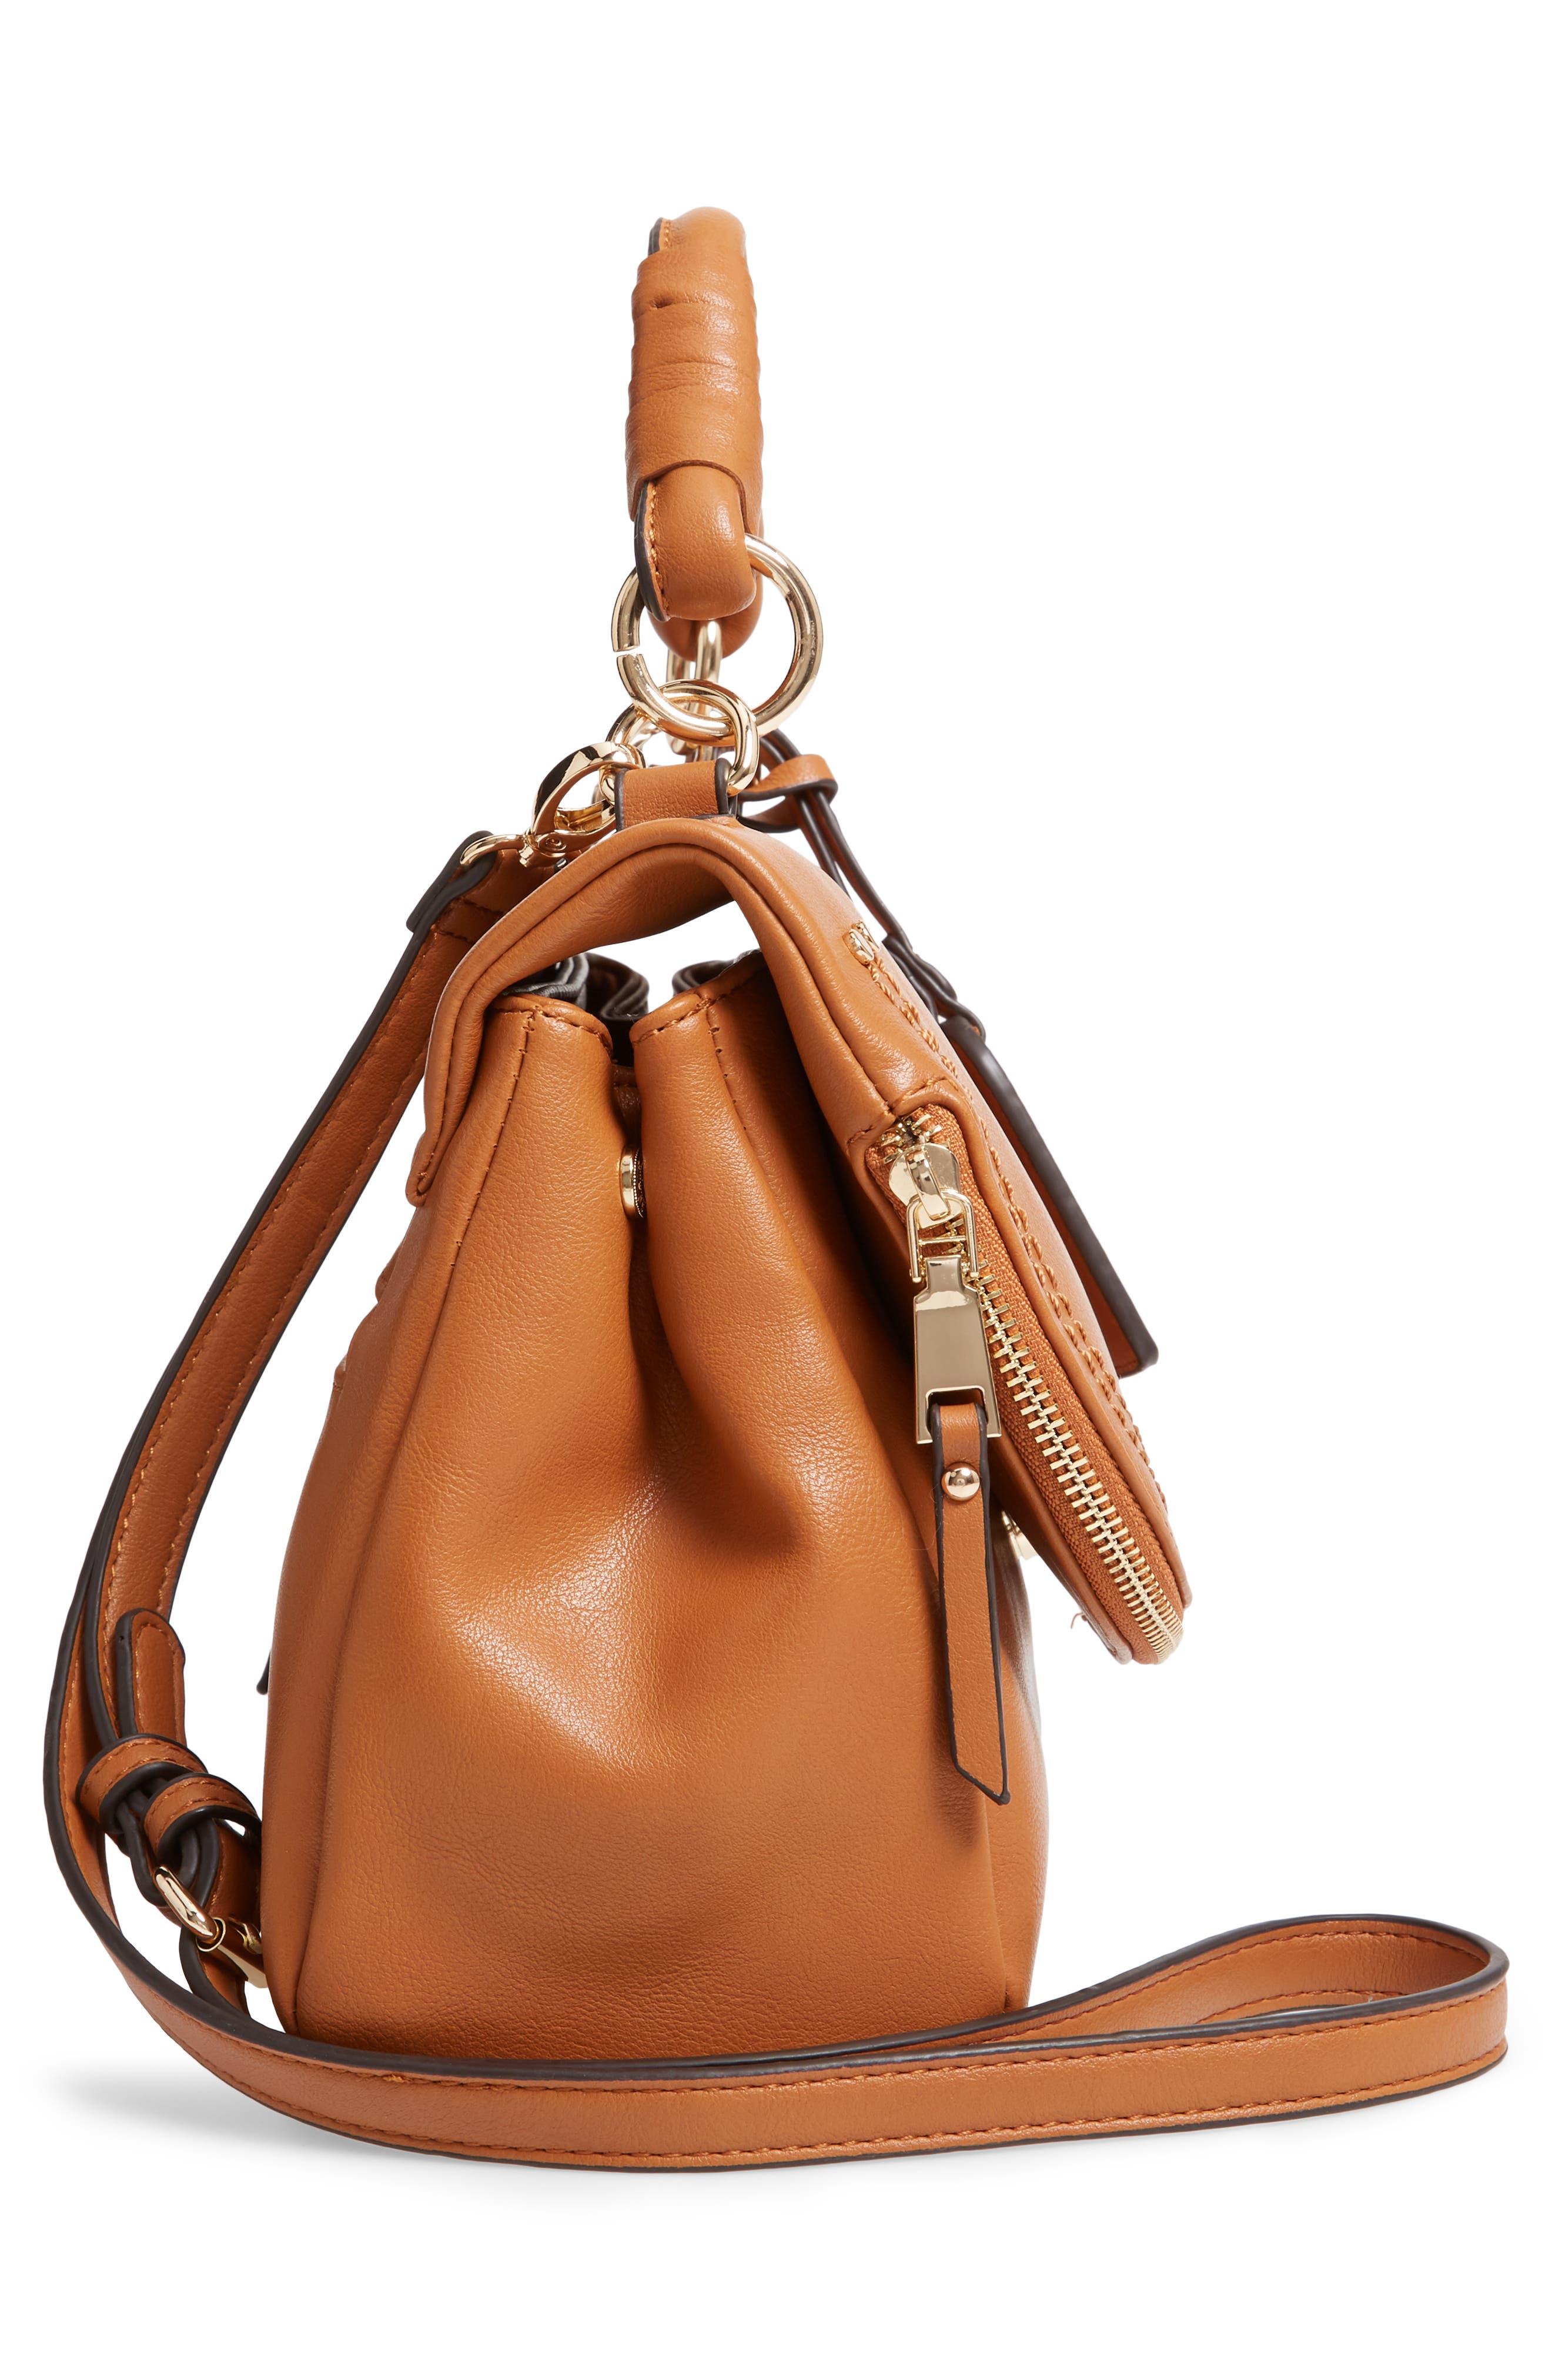 SOLE SOCIETY, Rubie Faux Leather Crossbody Bag, Alternate thumbnail 6, color, COGNAC